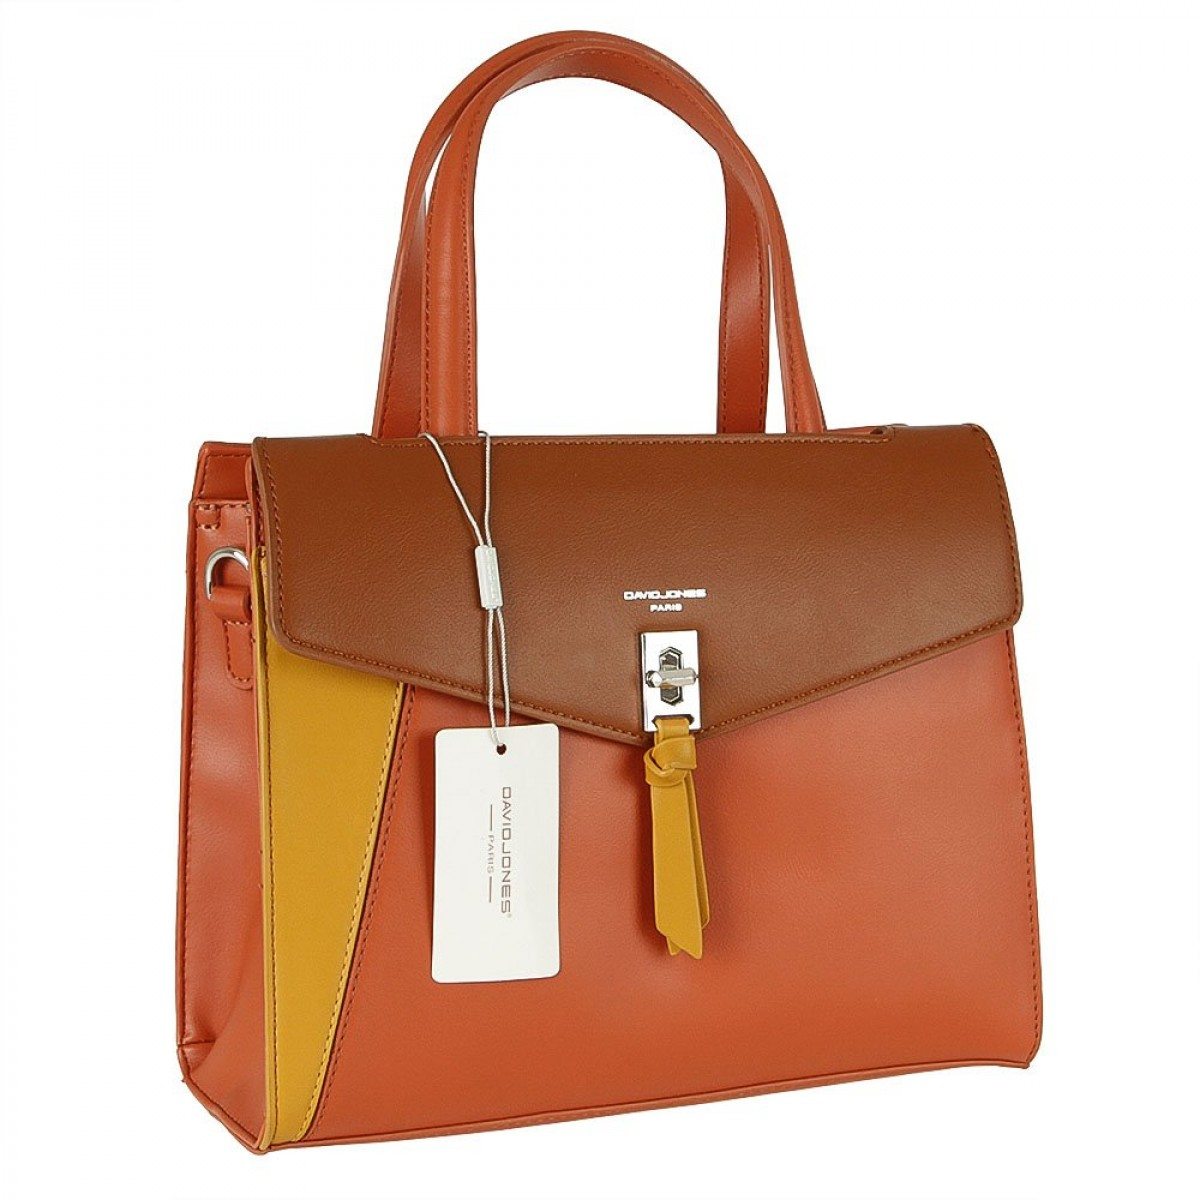 Жіноча сумка David Jones 6410-2 SIENNA